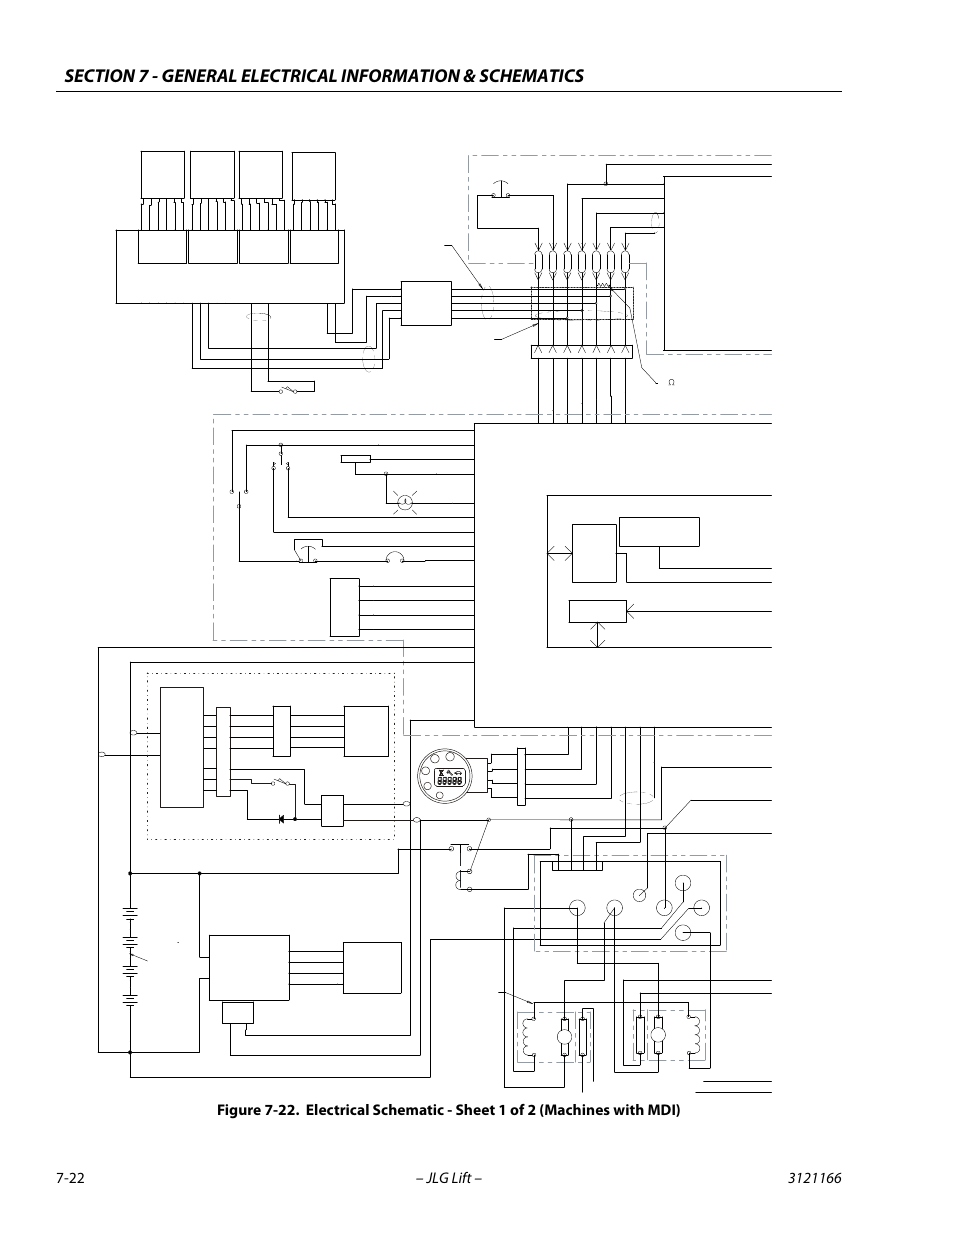 engine diagram wwwjustanswercom chrysler 4m93qchryslerptschematic circuitcar wiring diagram page 123 electrical wiringjlg 1932e2 wiring schematic auto electrical wiring diagramjlg lift